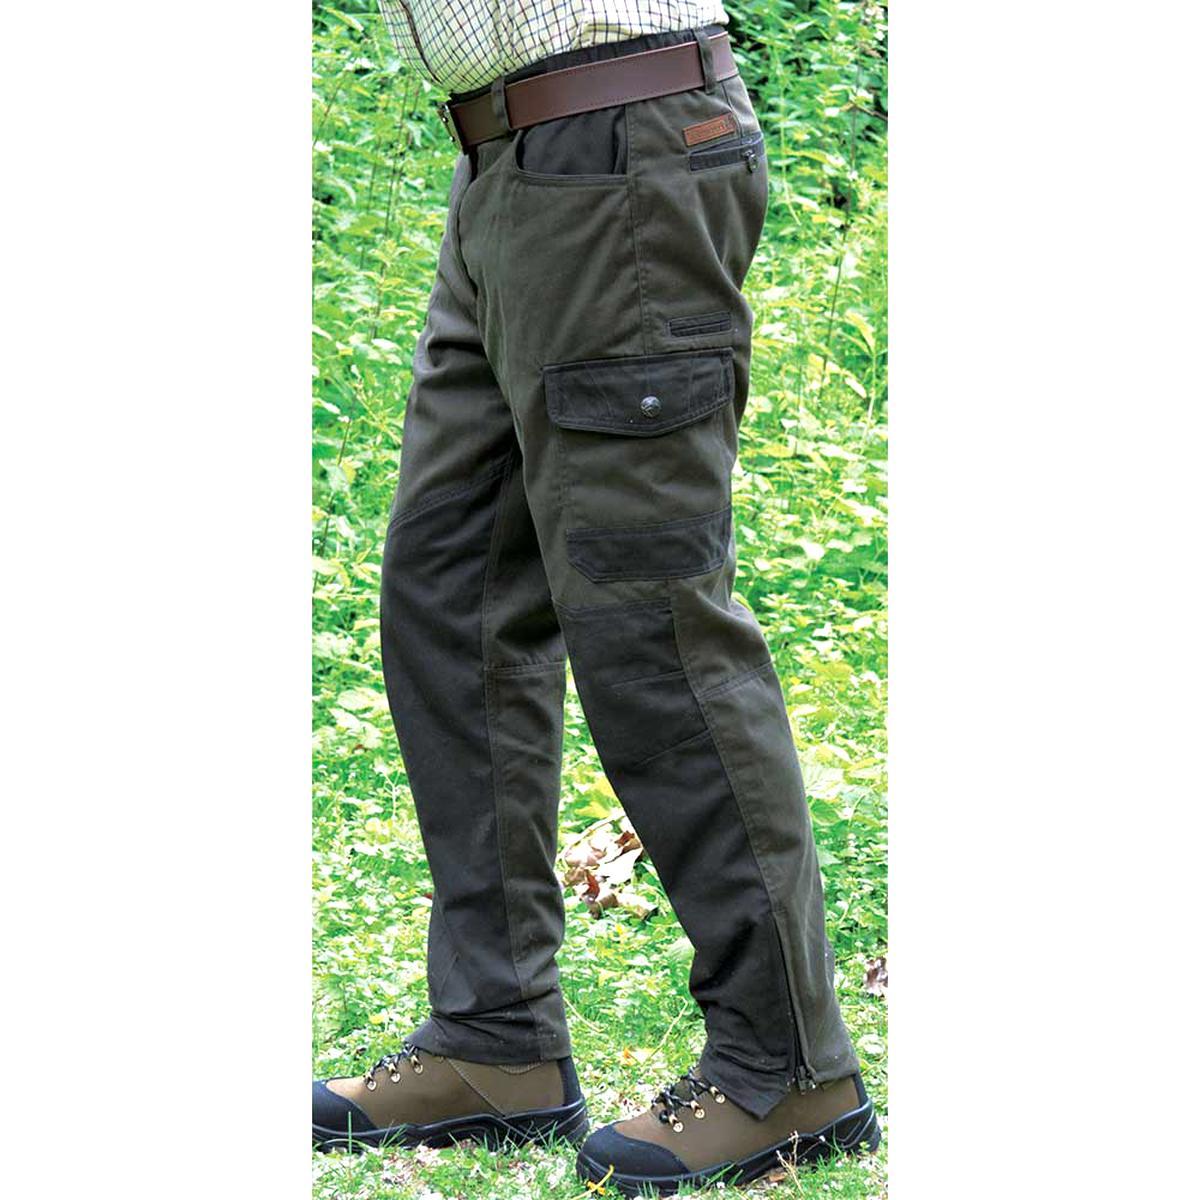 pantalon chasse d'occasion